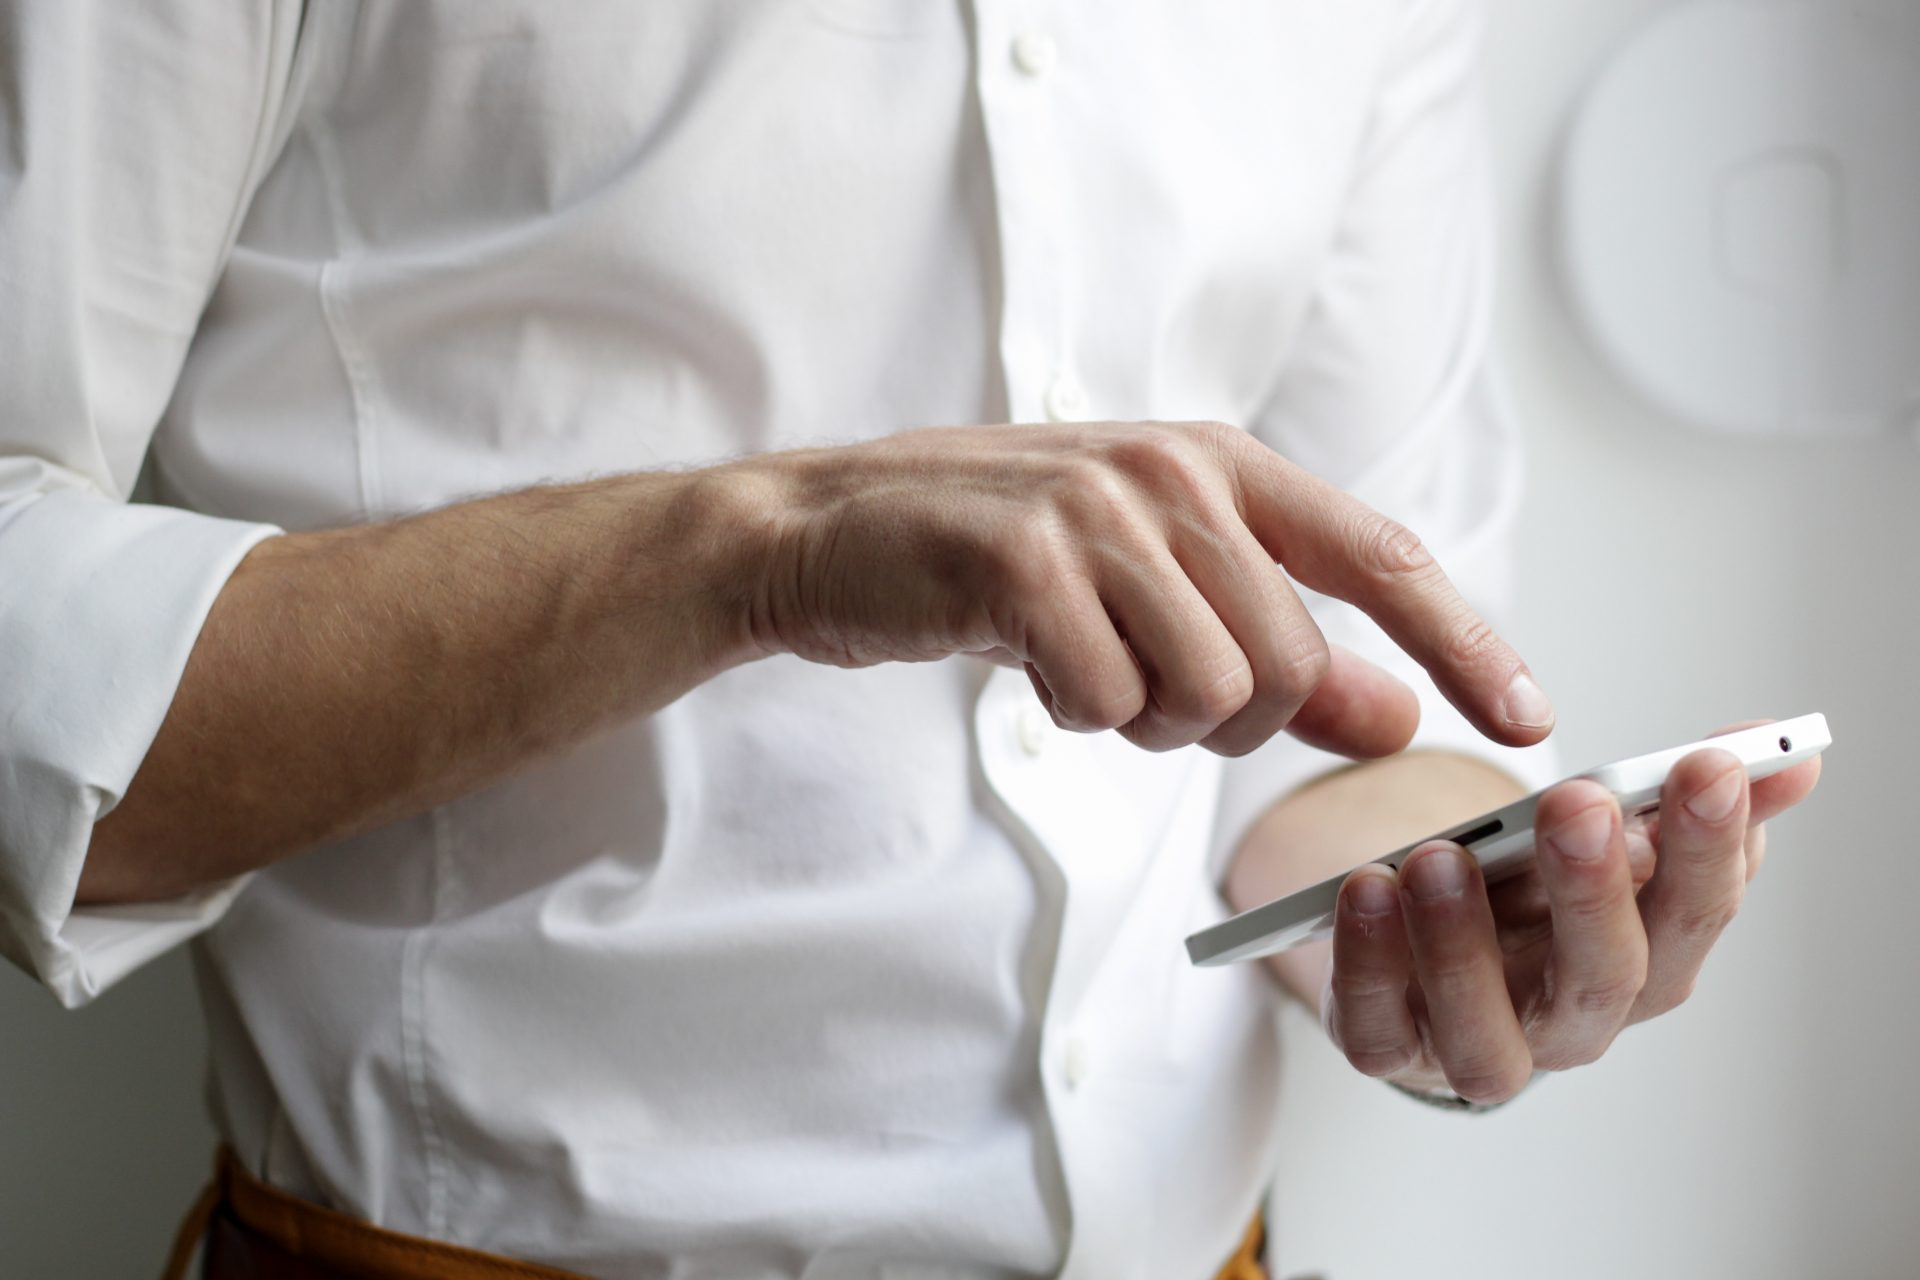 muz-mobil-ruky-objednavka-materialu-kosela